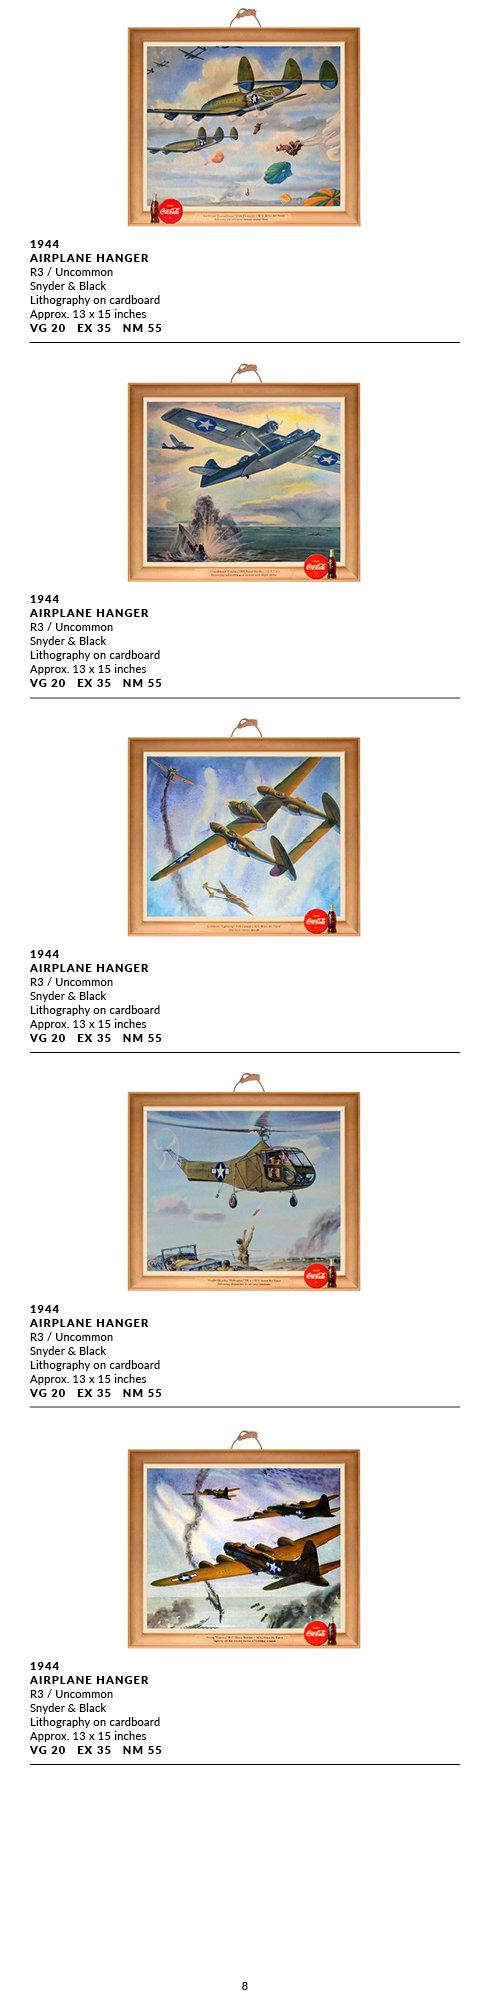 Aviation Cardboards_ DESKTOP_2020_8.jpg